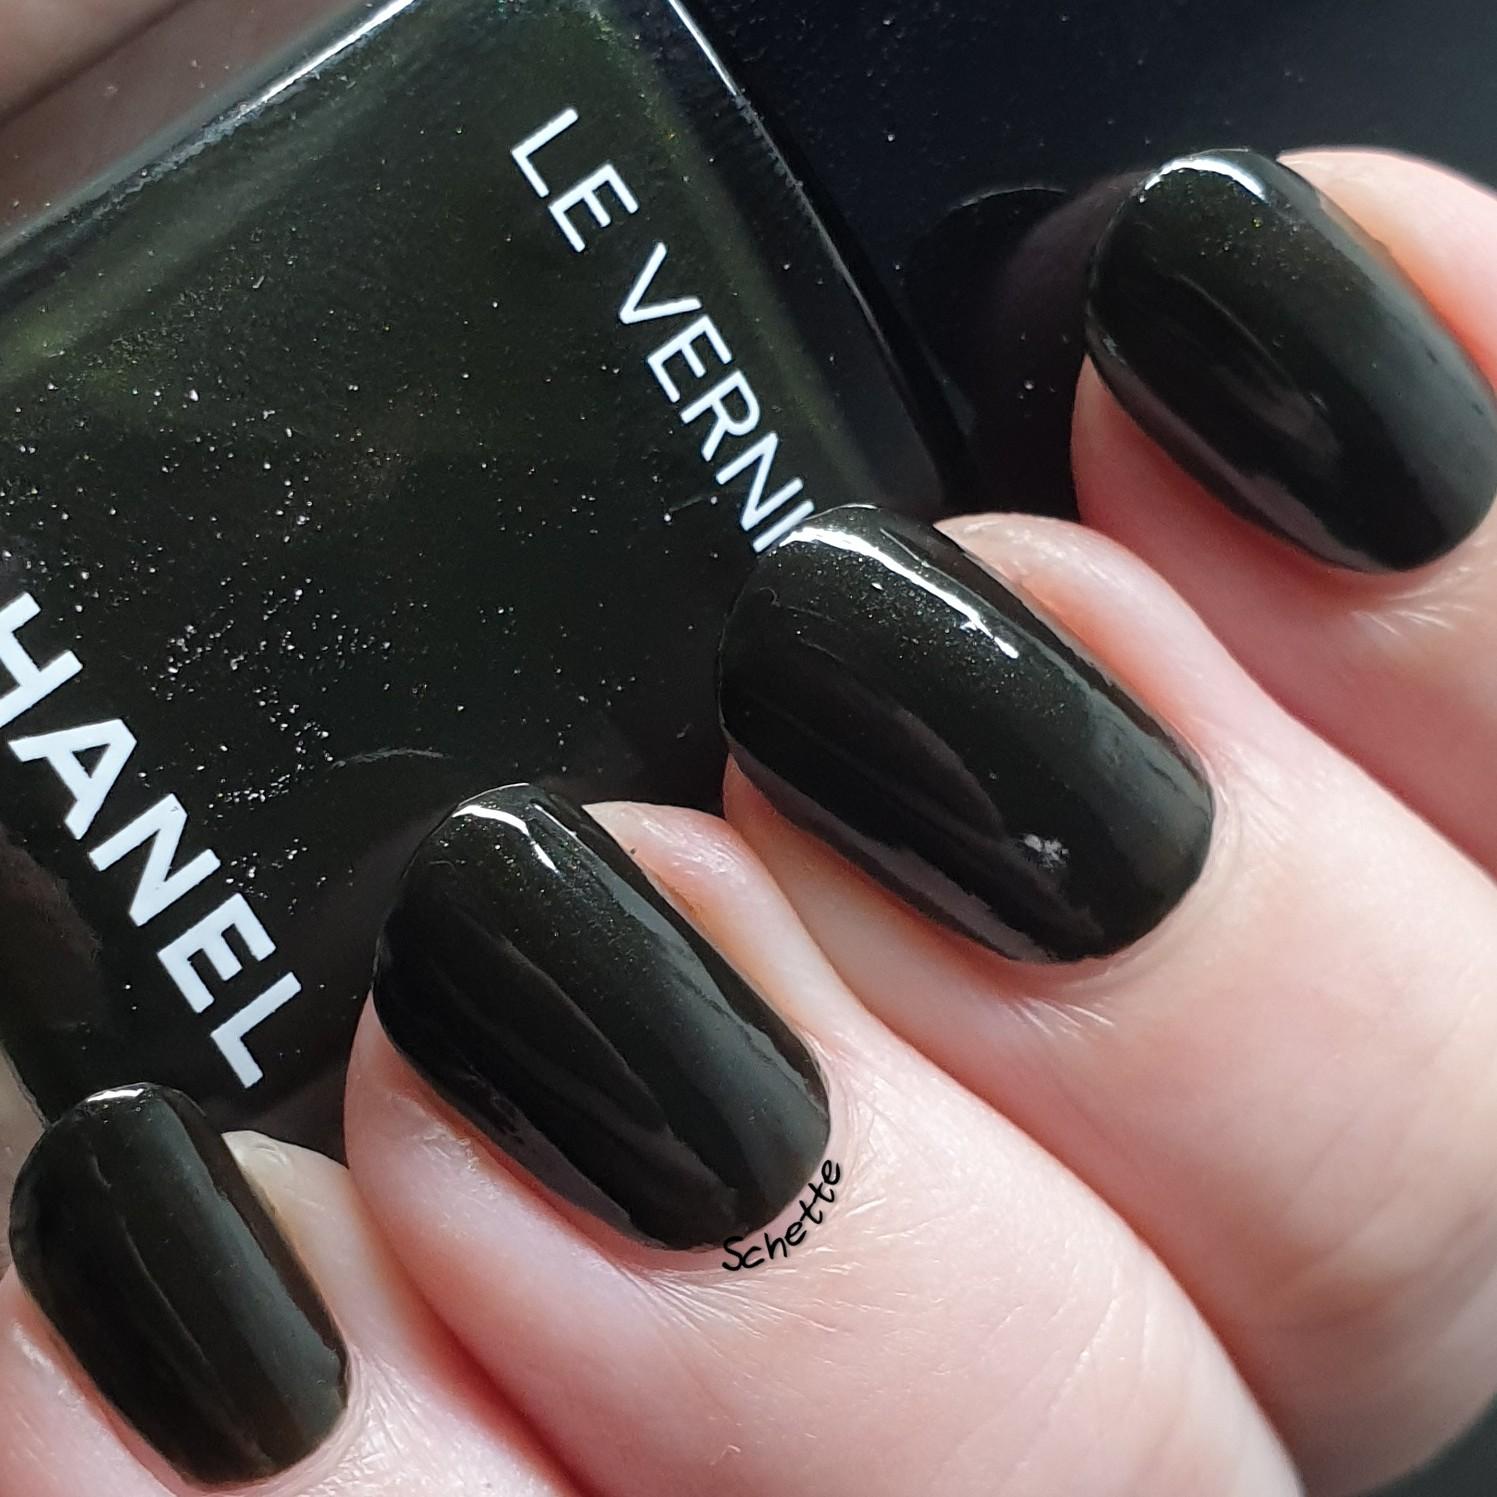 Chanel - Deepness